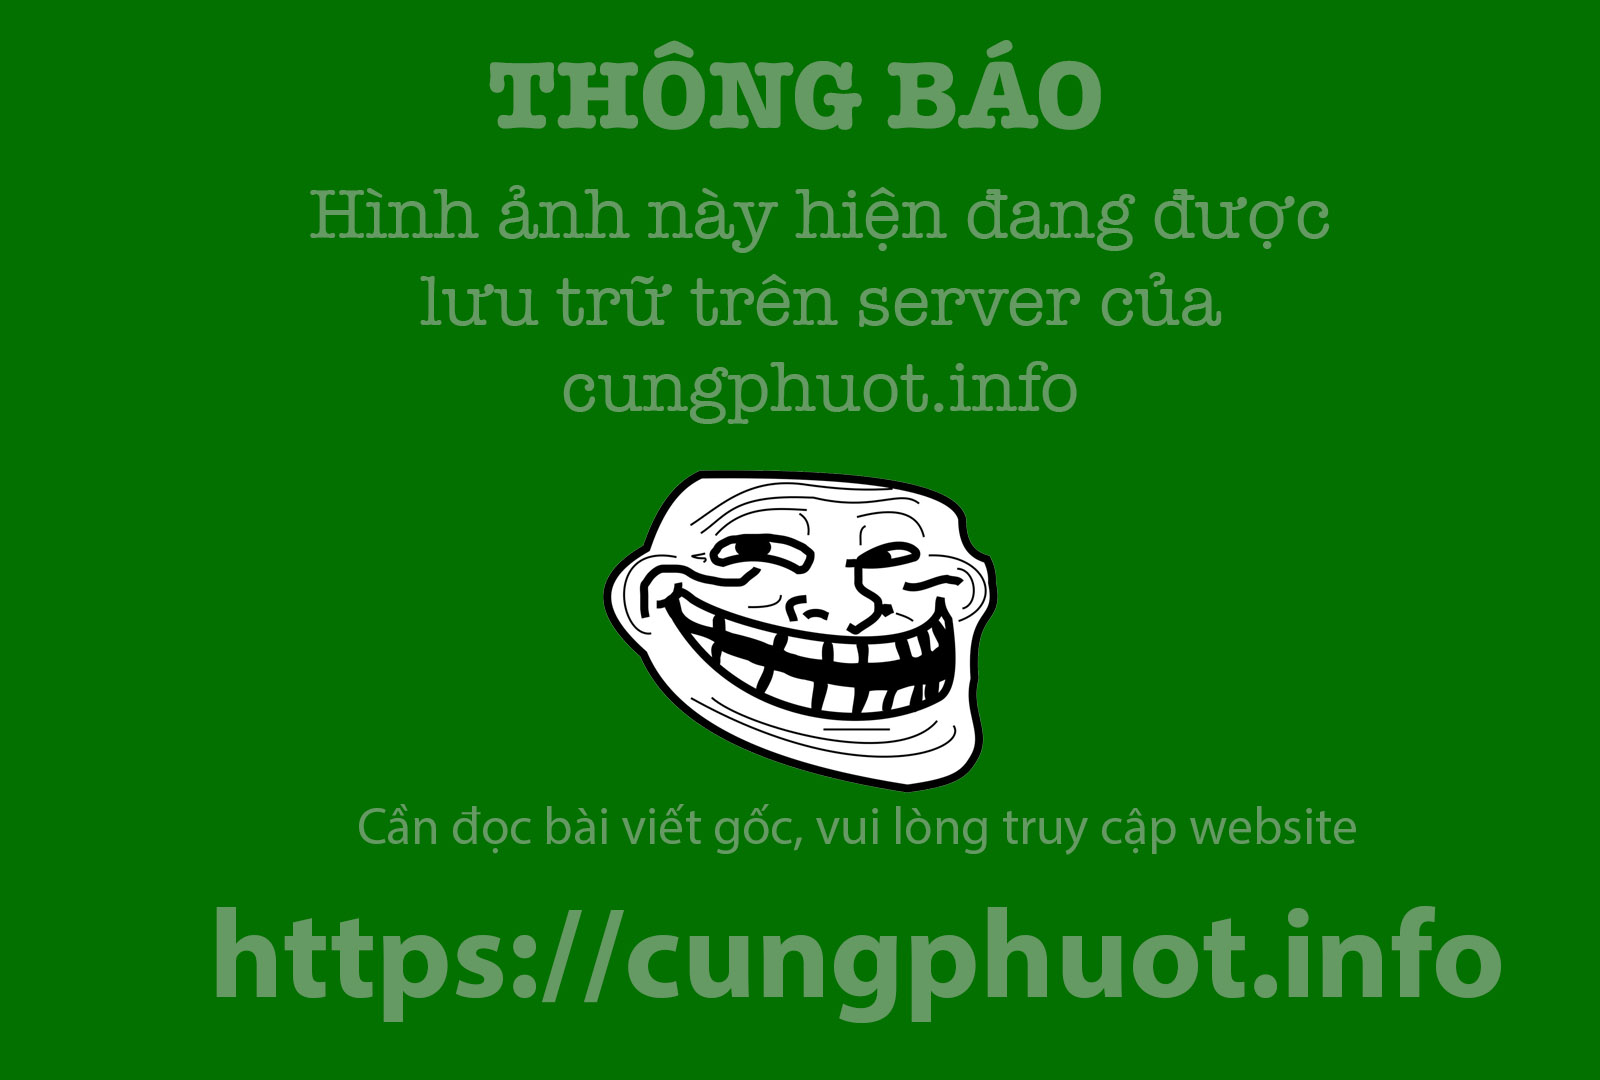 nhung-tiem-ca-phe-dep-phai-di-mot-lan-cho-biet-o-da-nang-ivivu-8